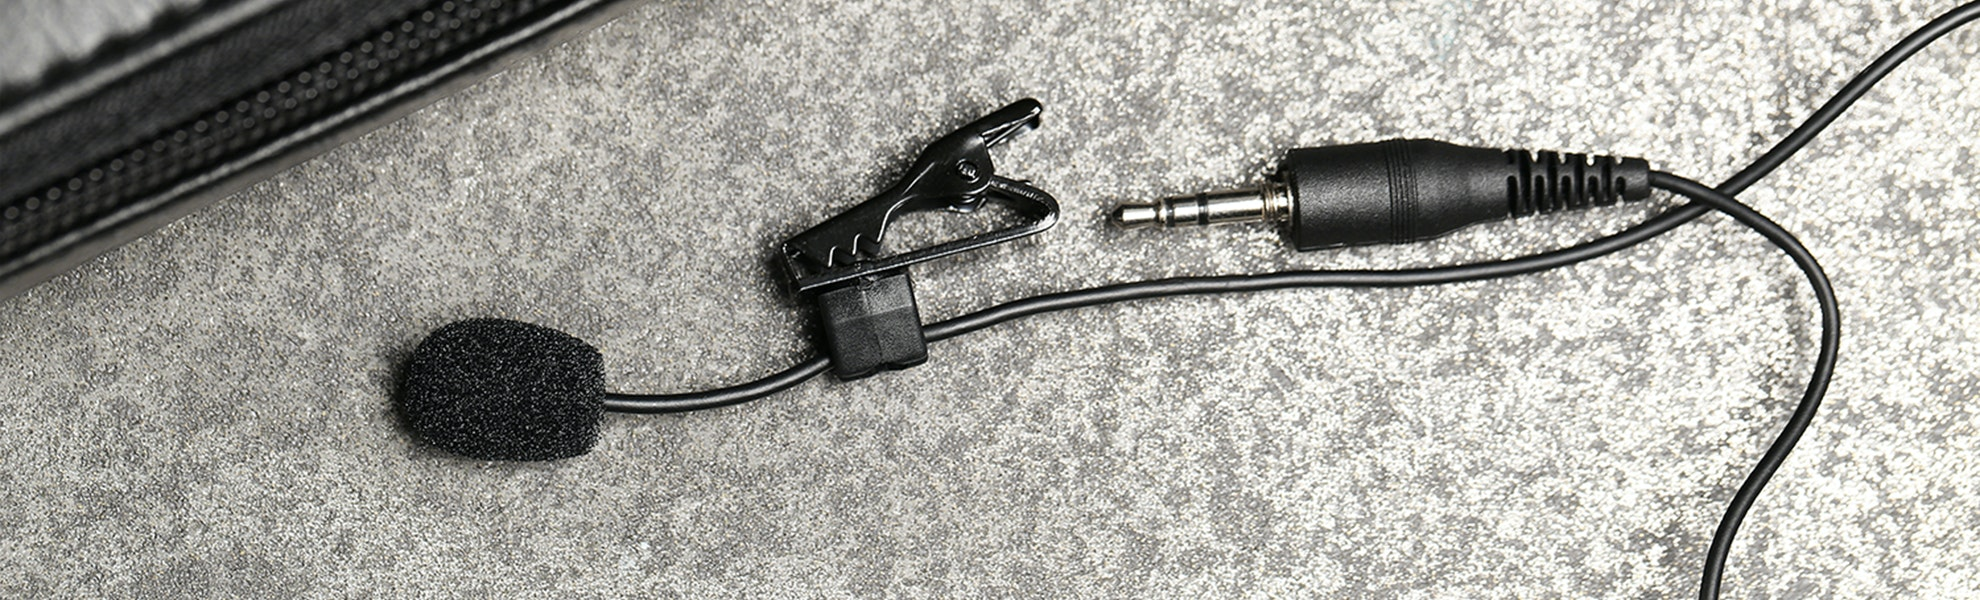 Samson LM10 Lavalier Microphone